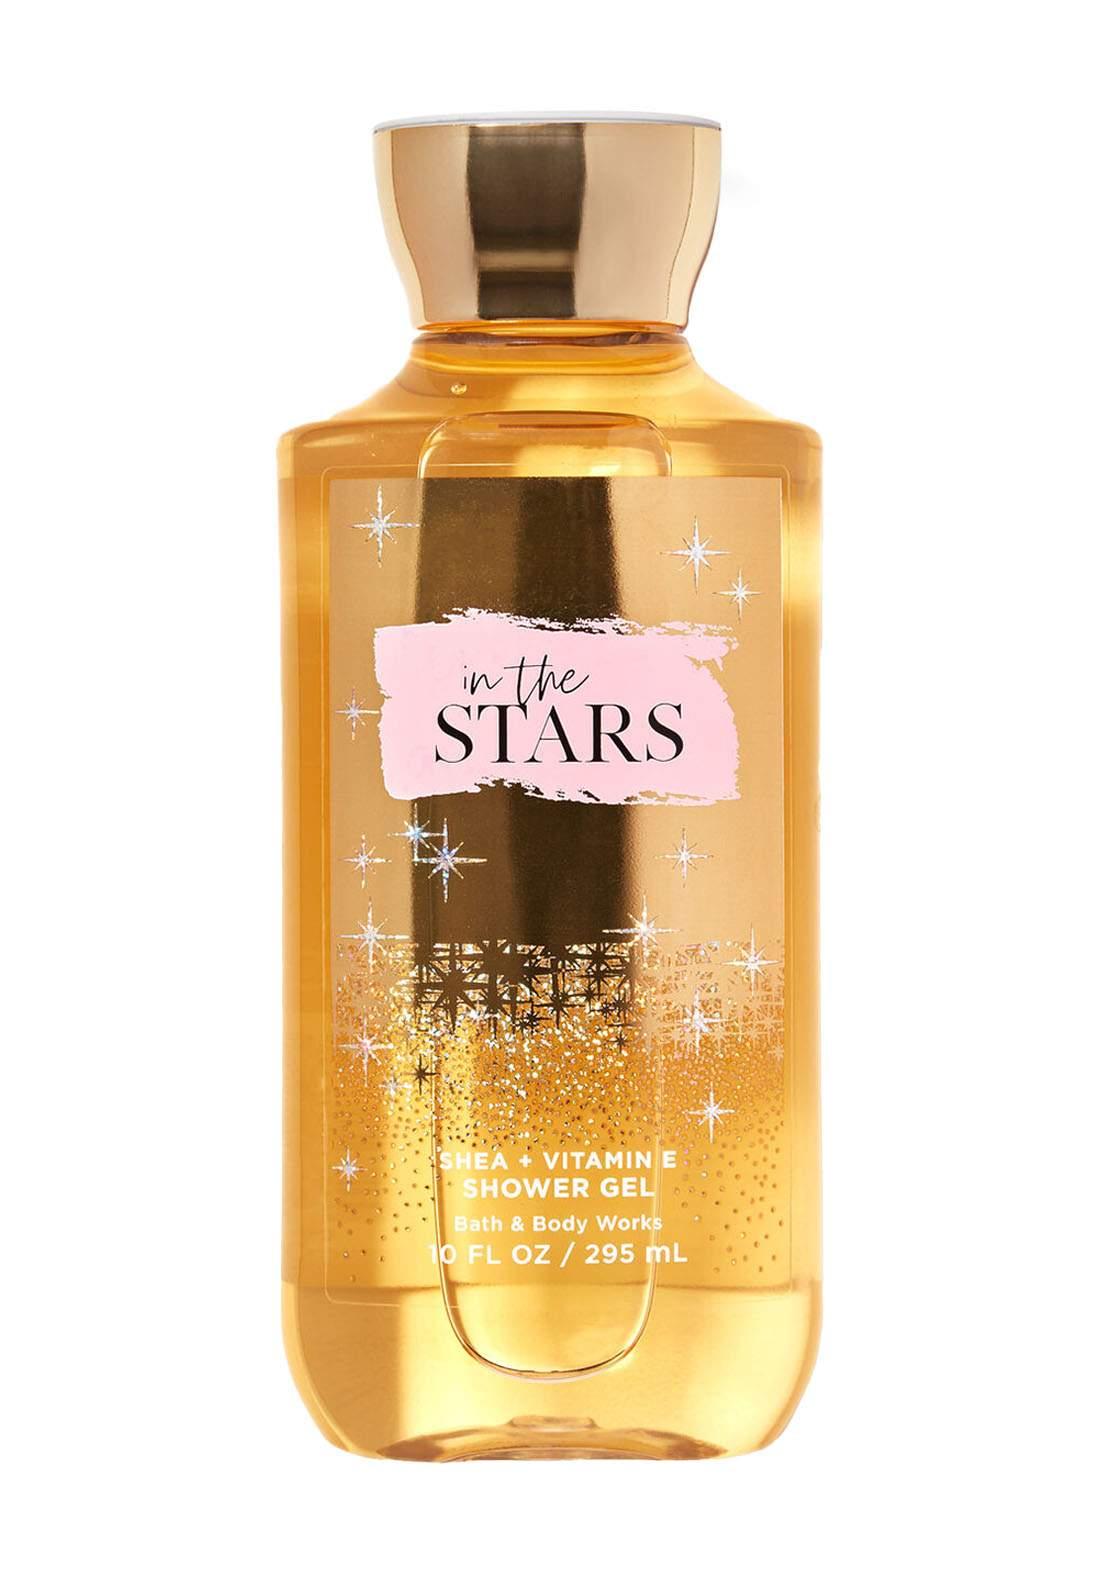 Bath And Body Works In the Stars Shower Gel 295ml جل استحمام